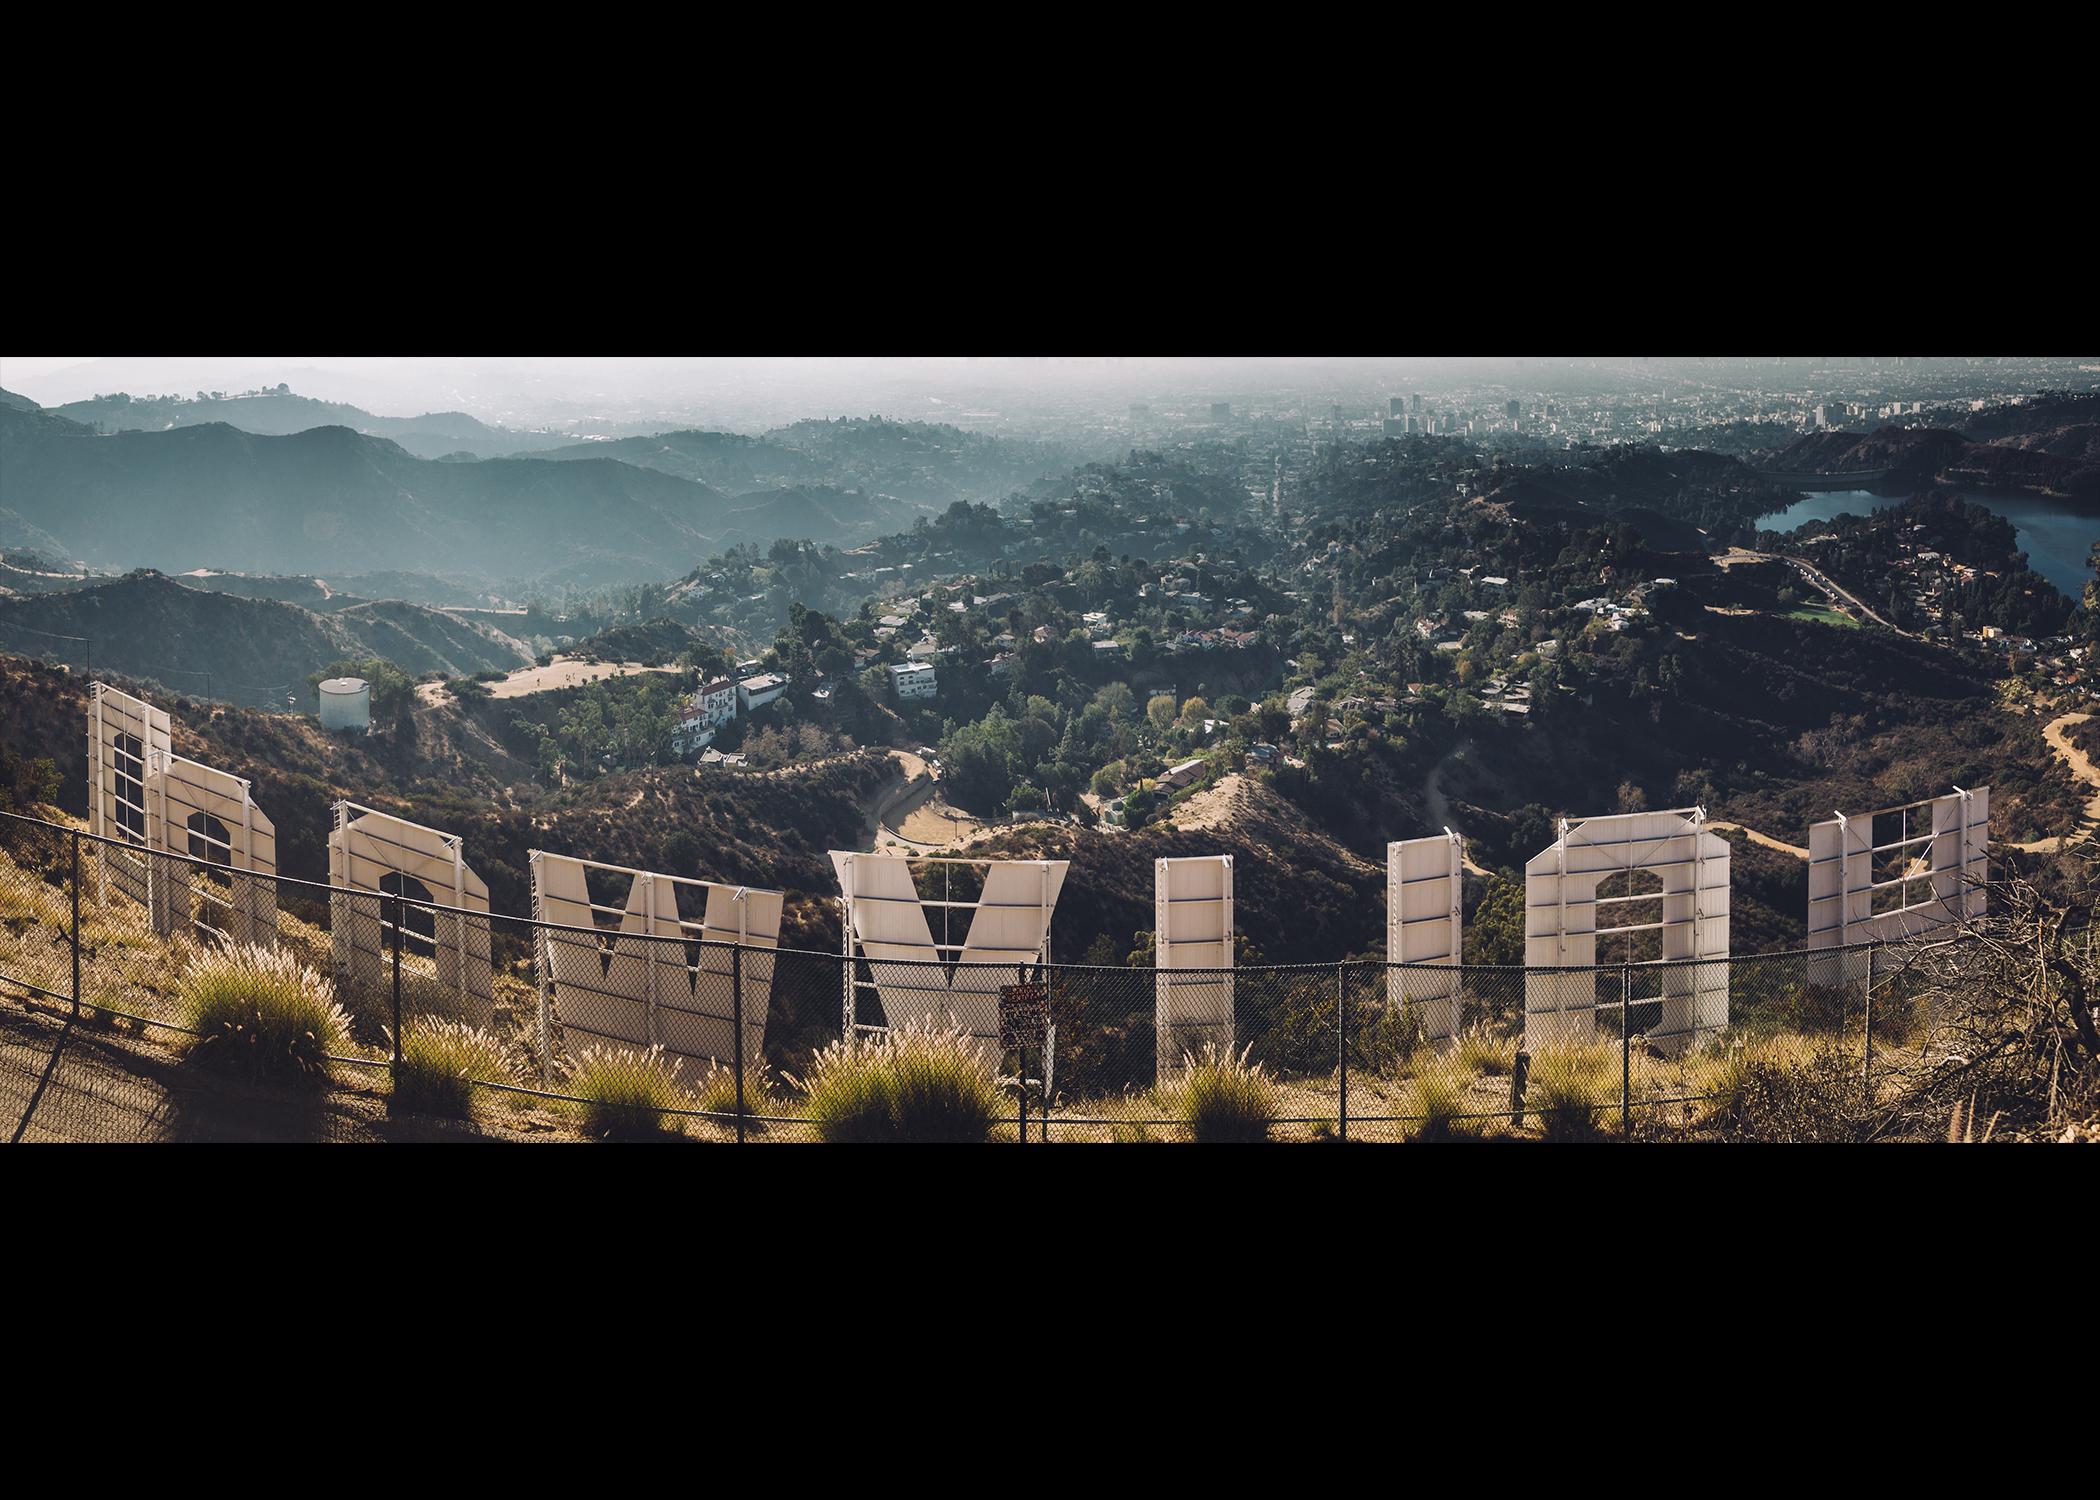 Los Angeles Landscape Photography